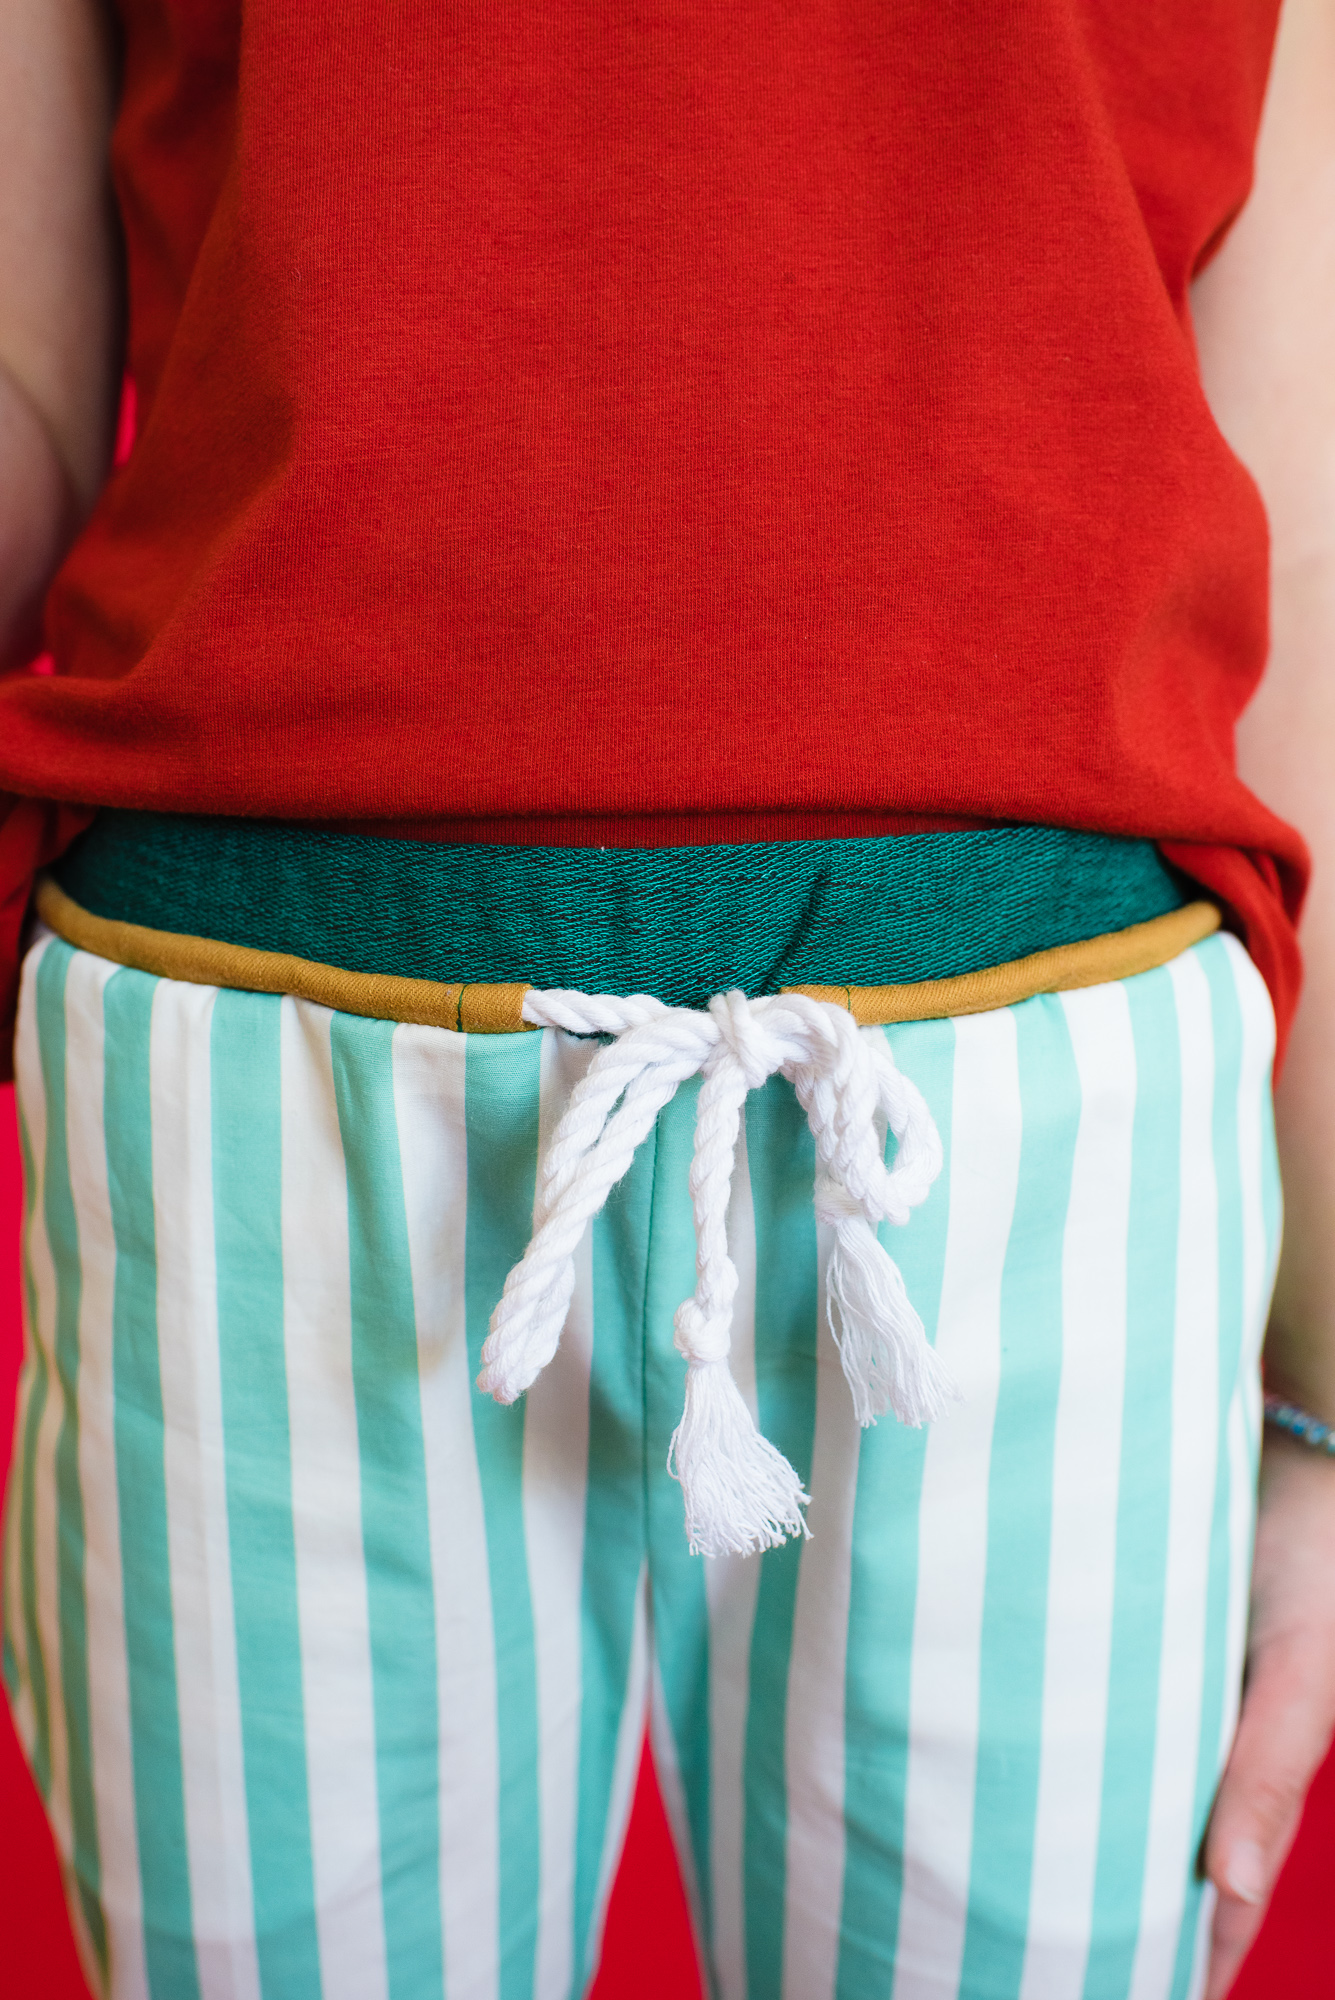 prp-kids-sewing-patterns40.jpg